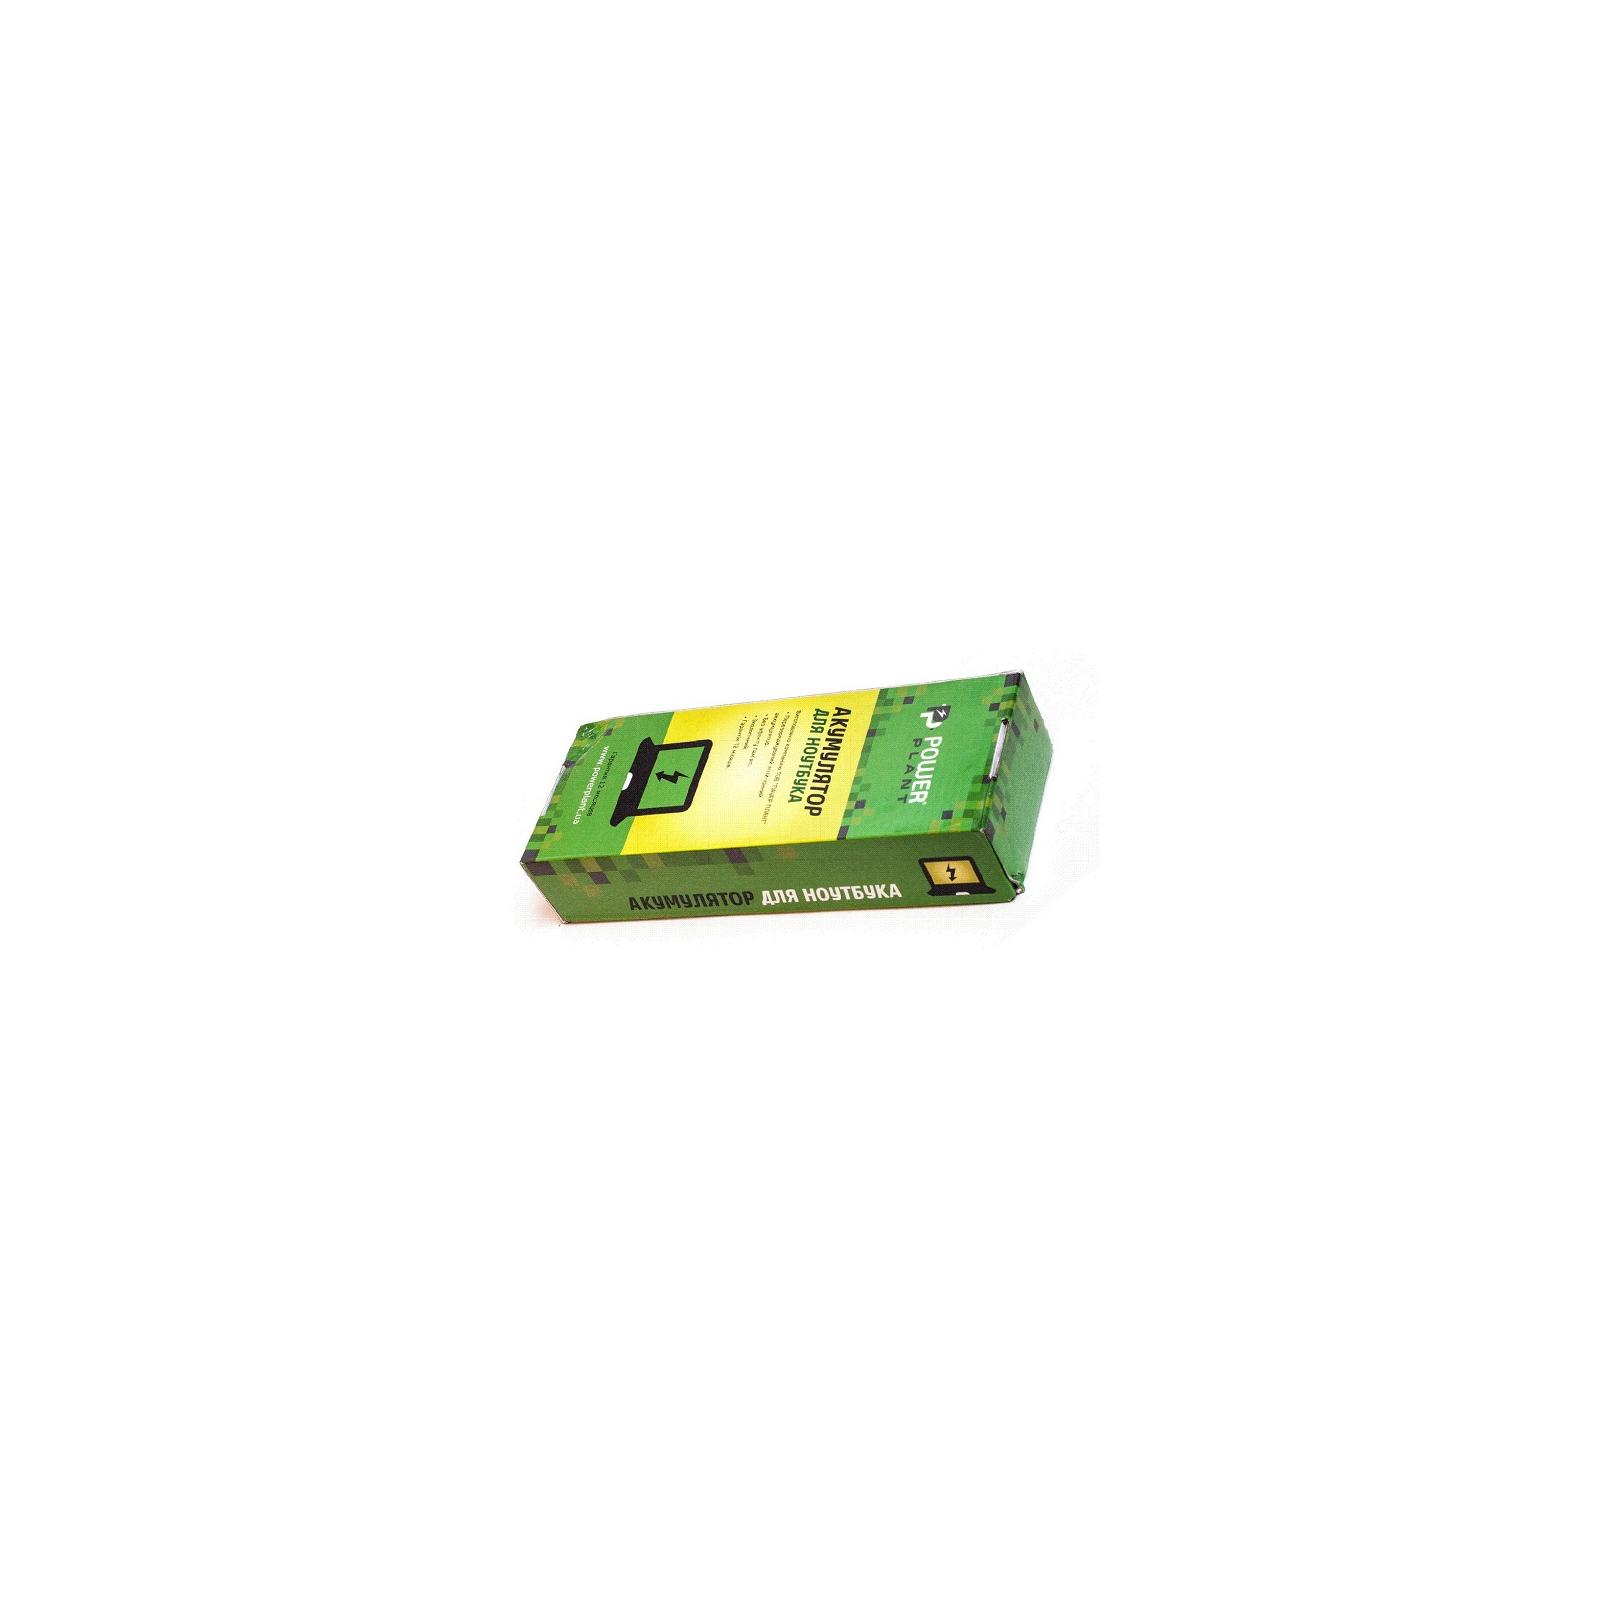 Аккумулятор для ноутбука ASUS A32-K52 (A32-K52, ASA420LH) 10.8V 4400mAh PowerPlant (NB00000284) изображение 3